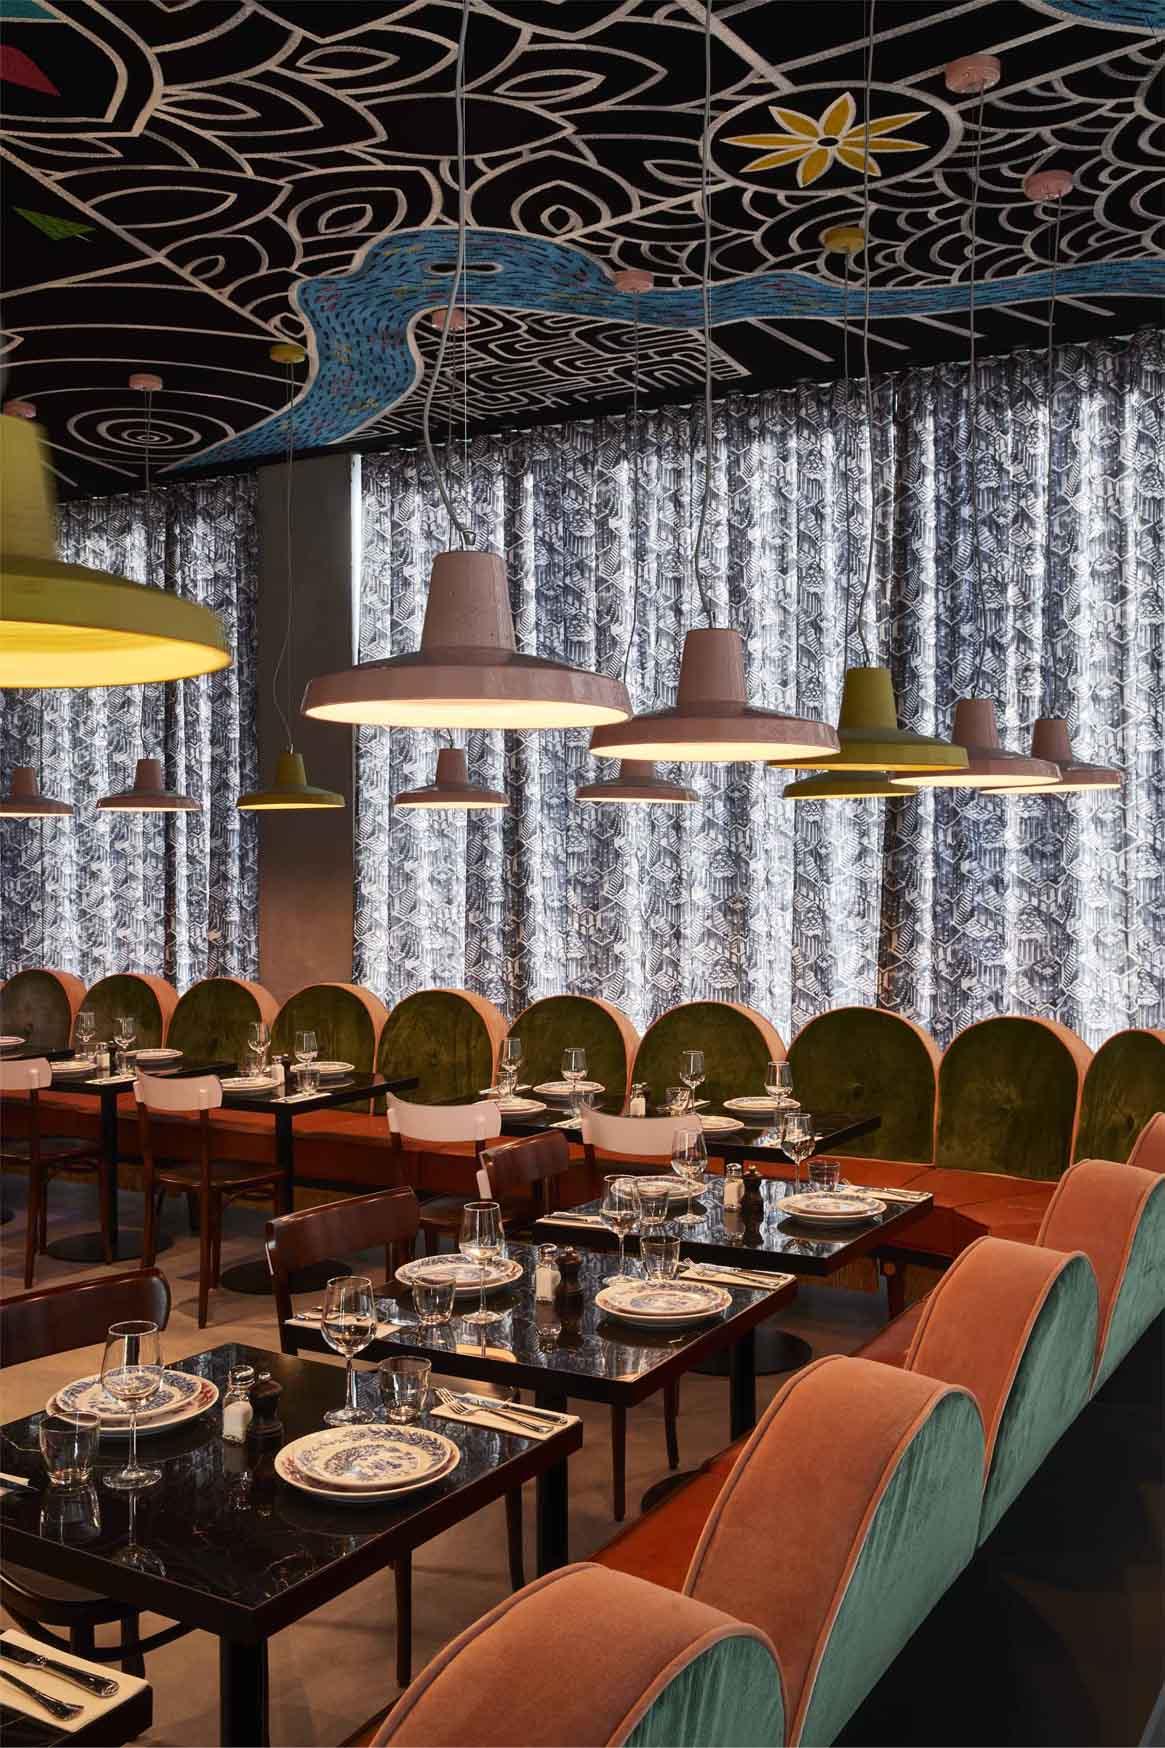 Kleinbettingen restaurant chandeliers best binary options signals providers connection